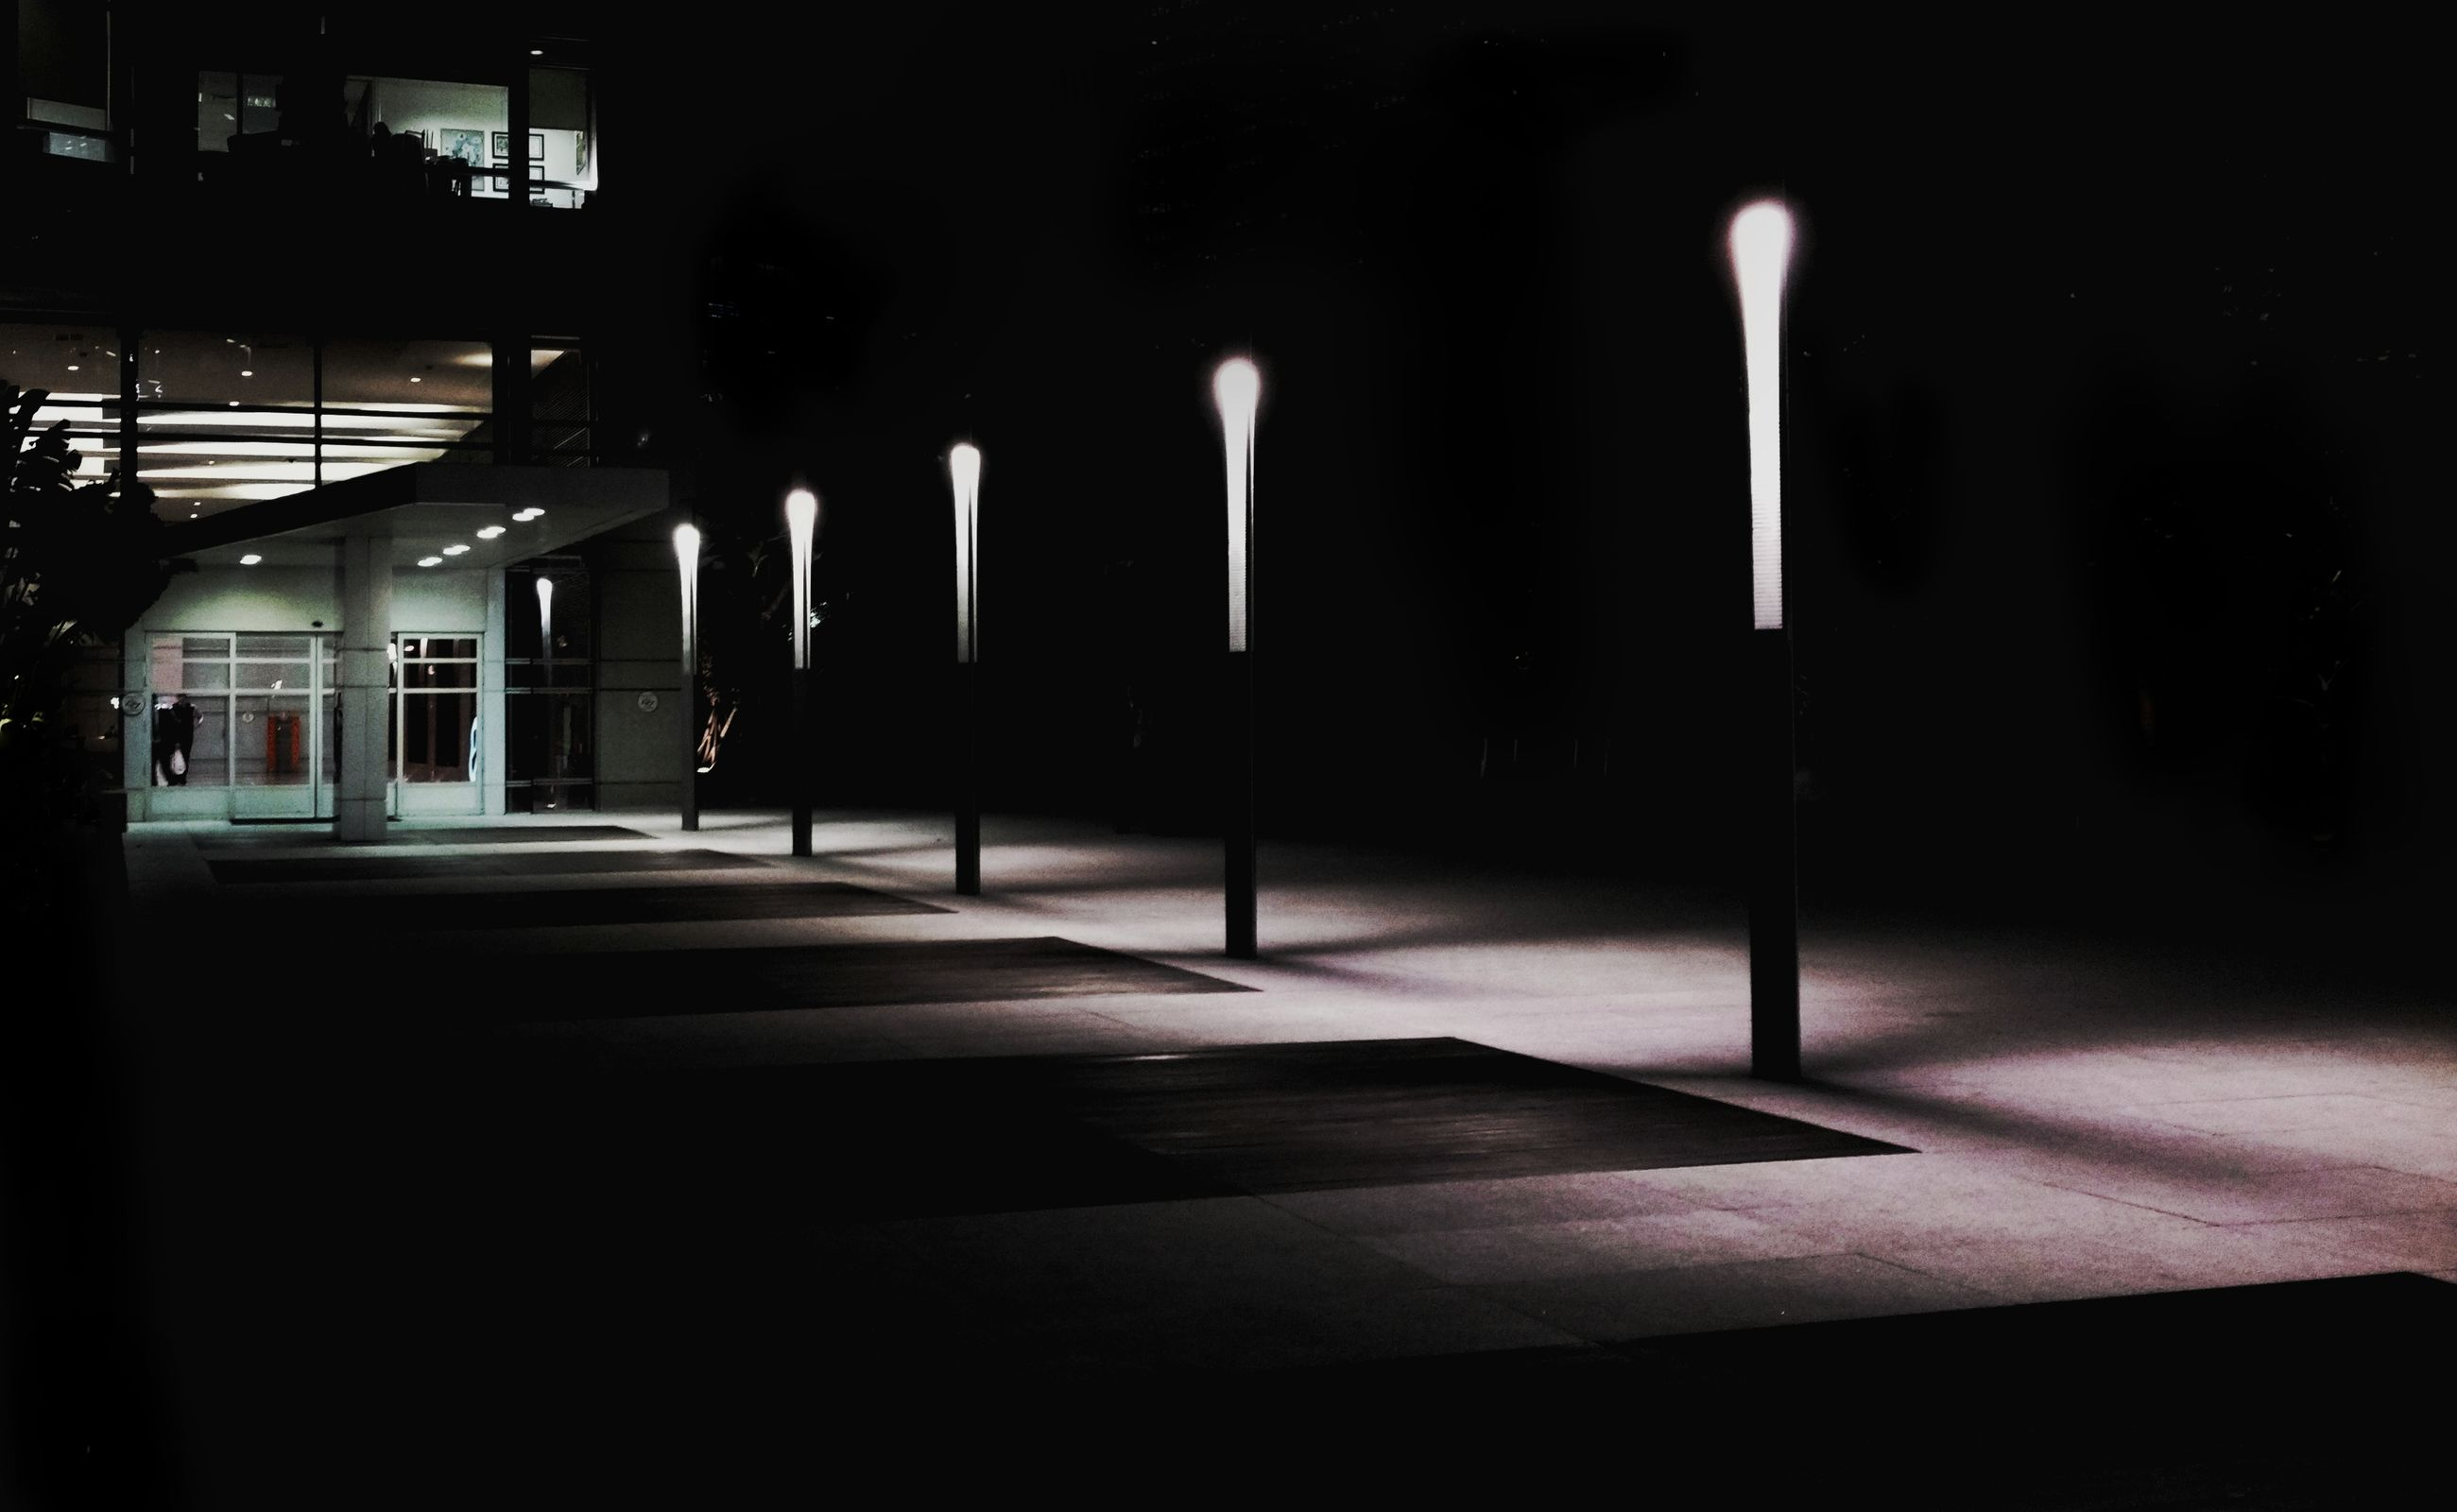 shadow, dark, no people, indoors, day